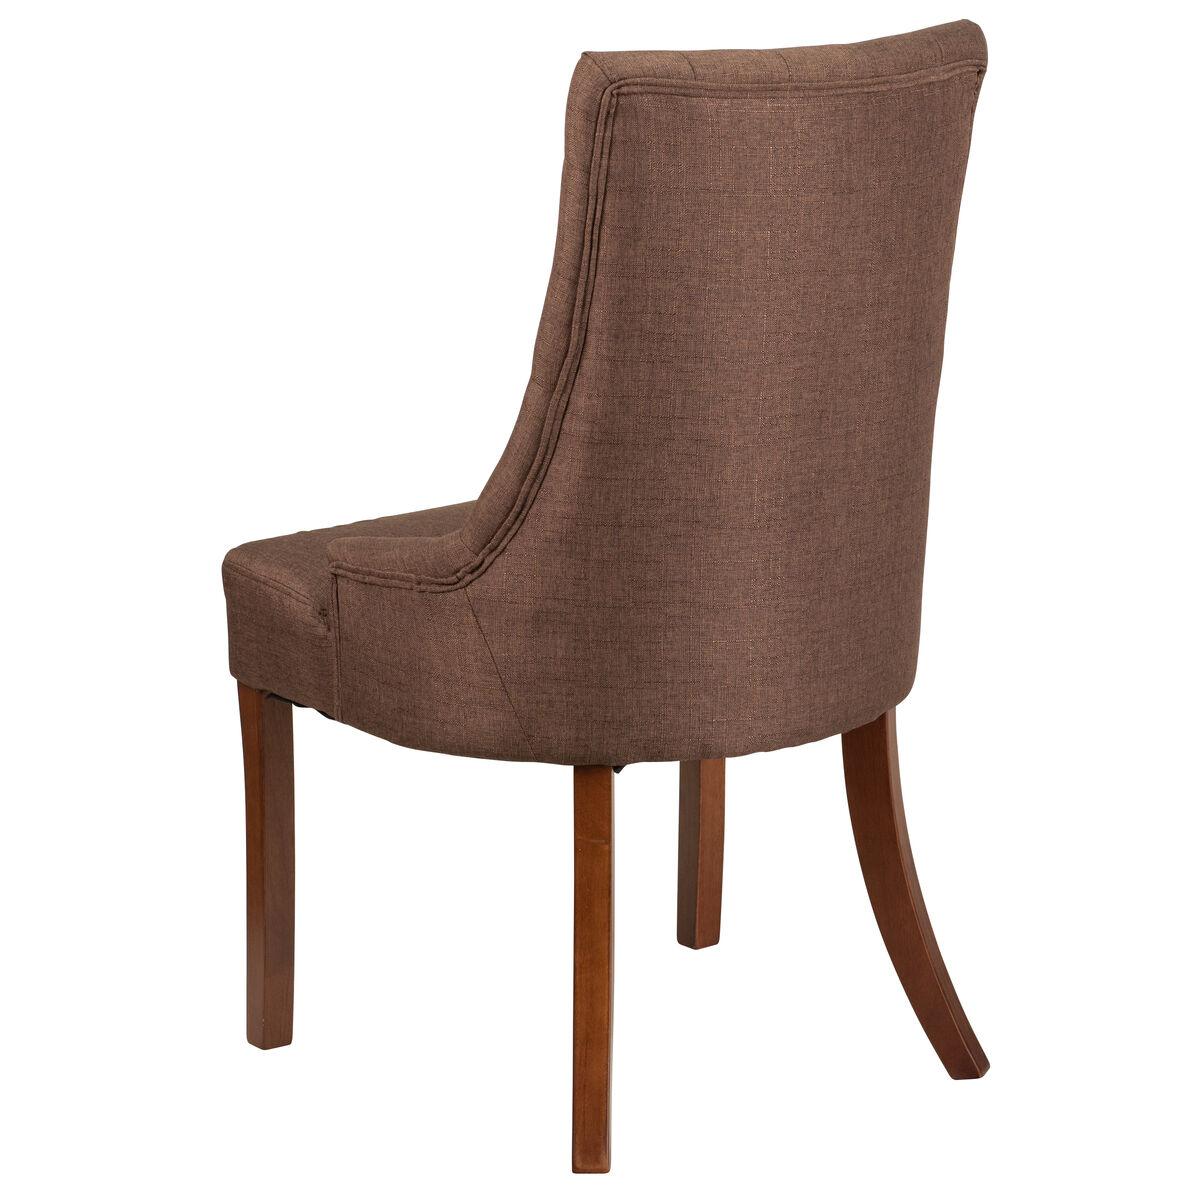 Hercules paddington series brown fabric tufted chair inset